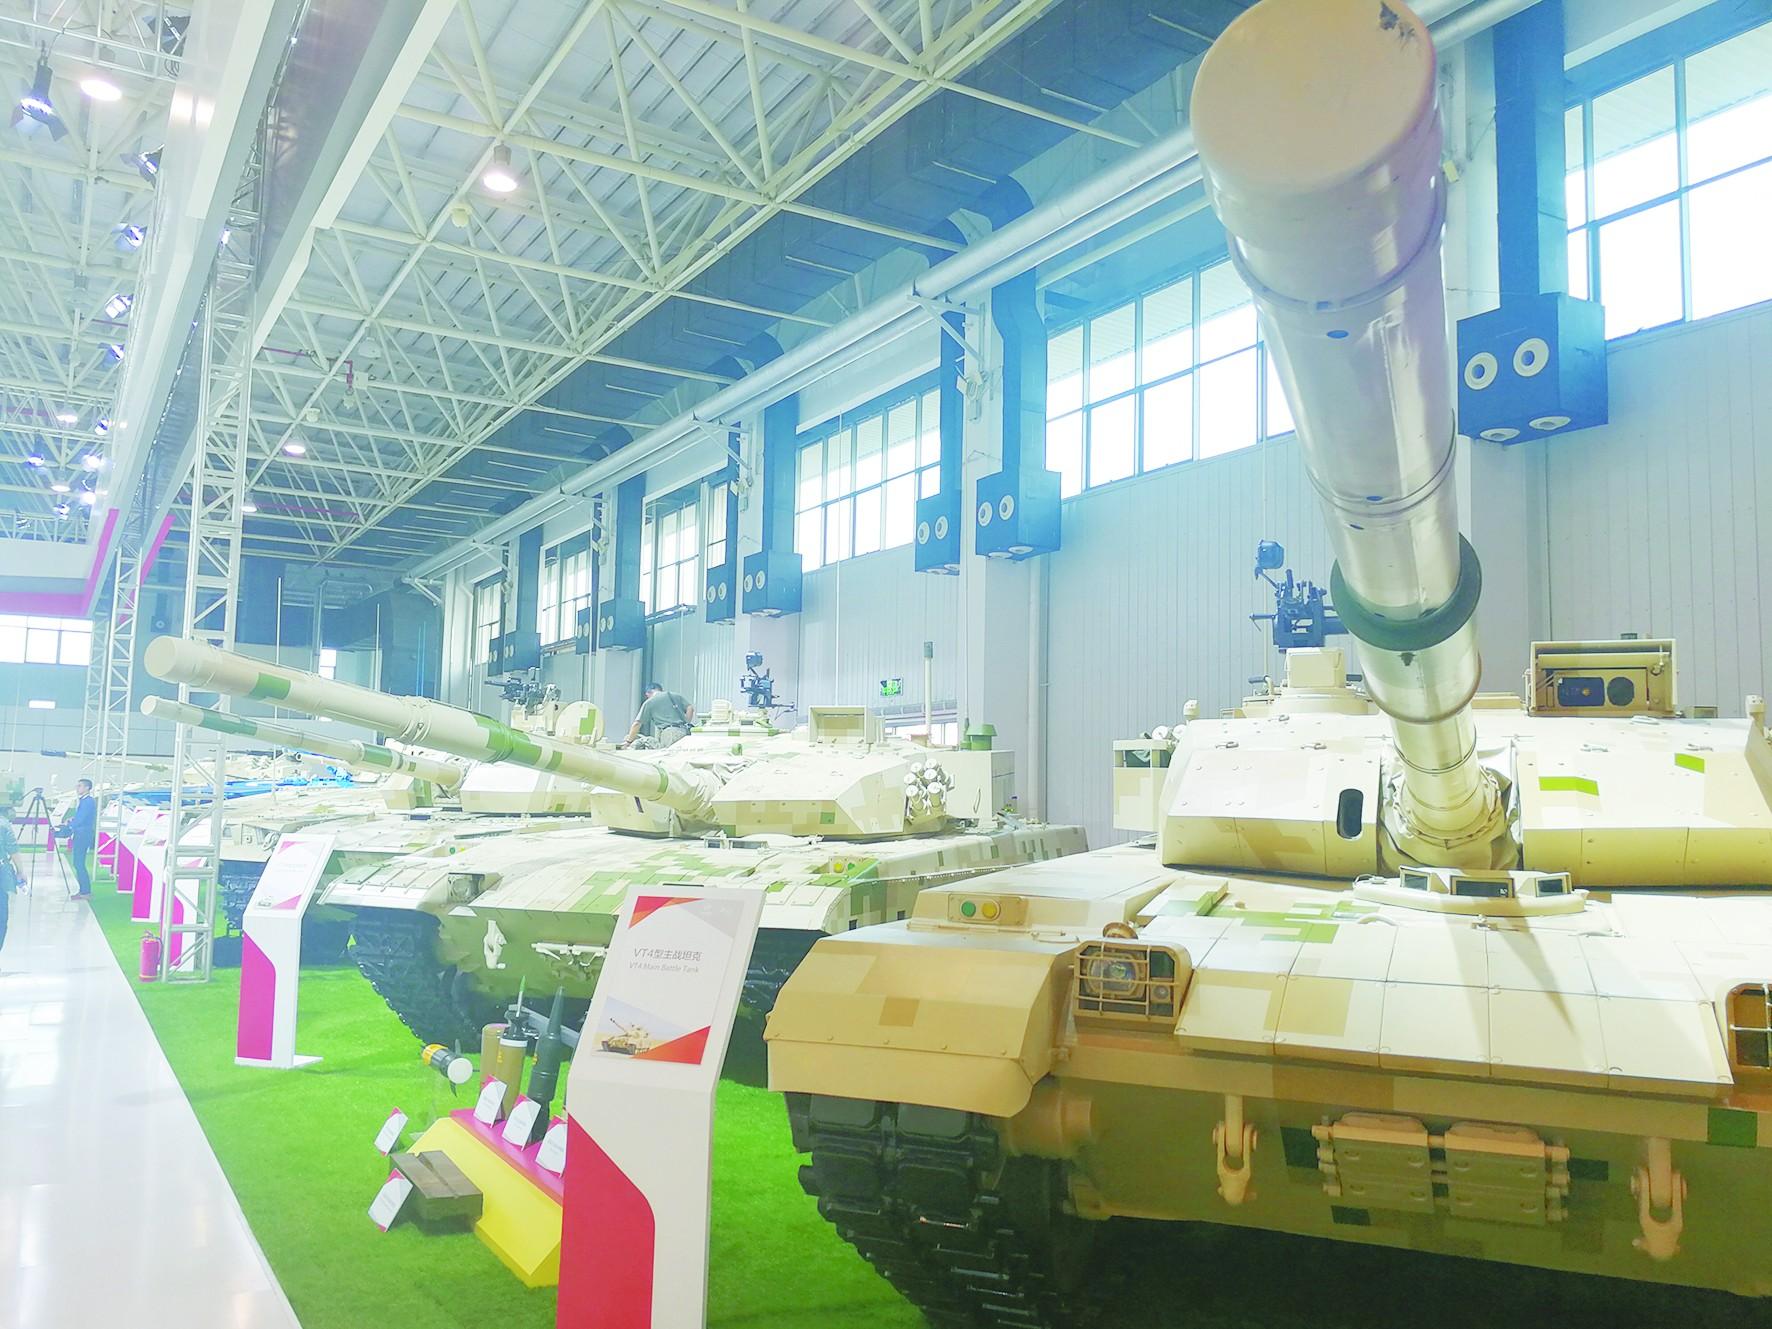 VT-5轻坦变身重型步战车!具备接近坦克级防护能力